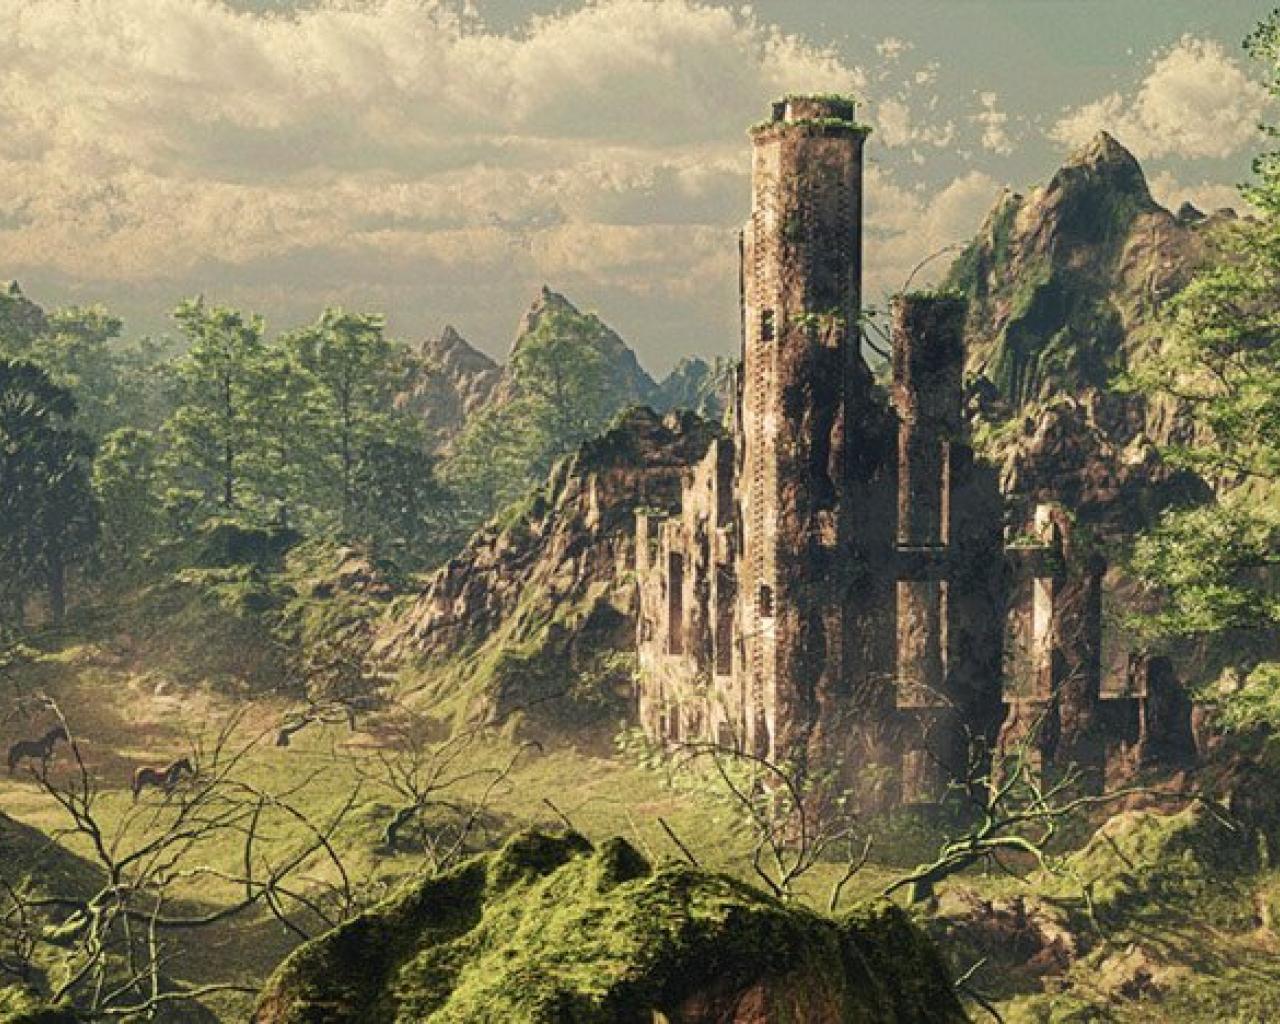 1280x1024 Forest Palace hình nền